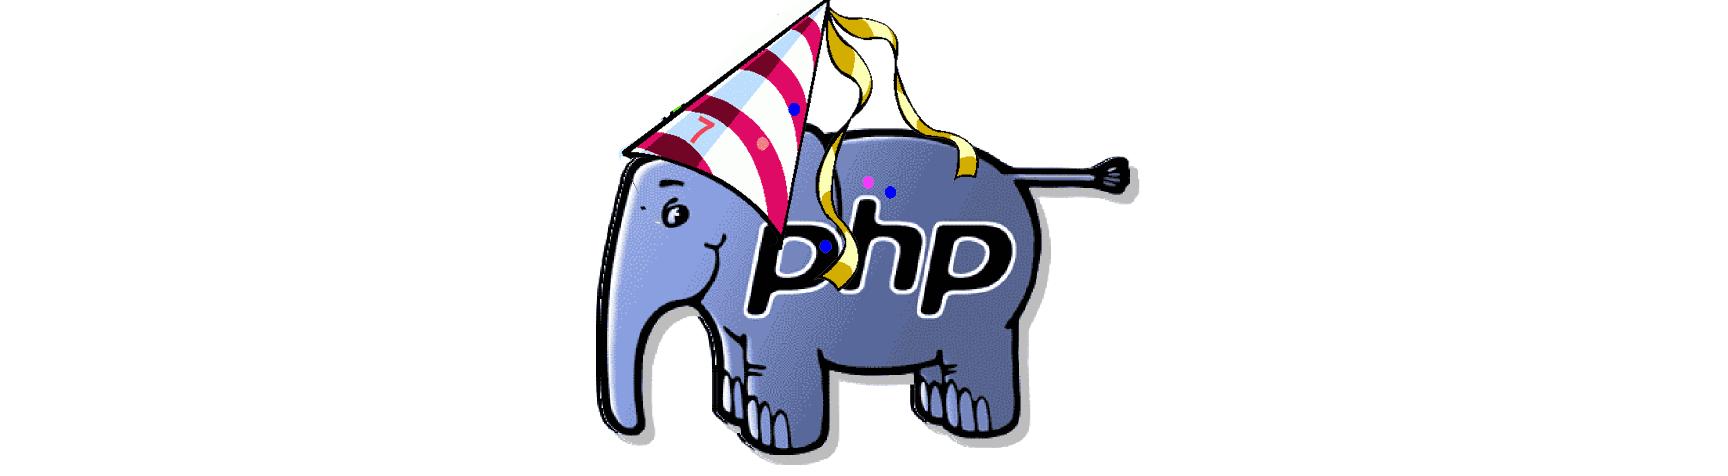 php 7 upgrade drupal wordpress magento